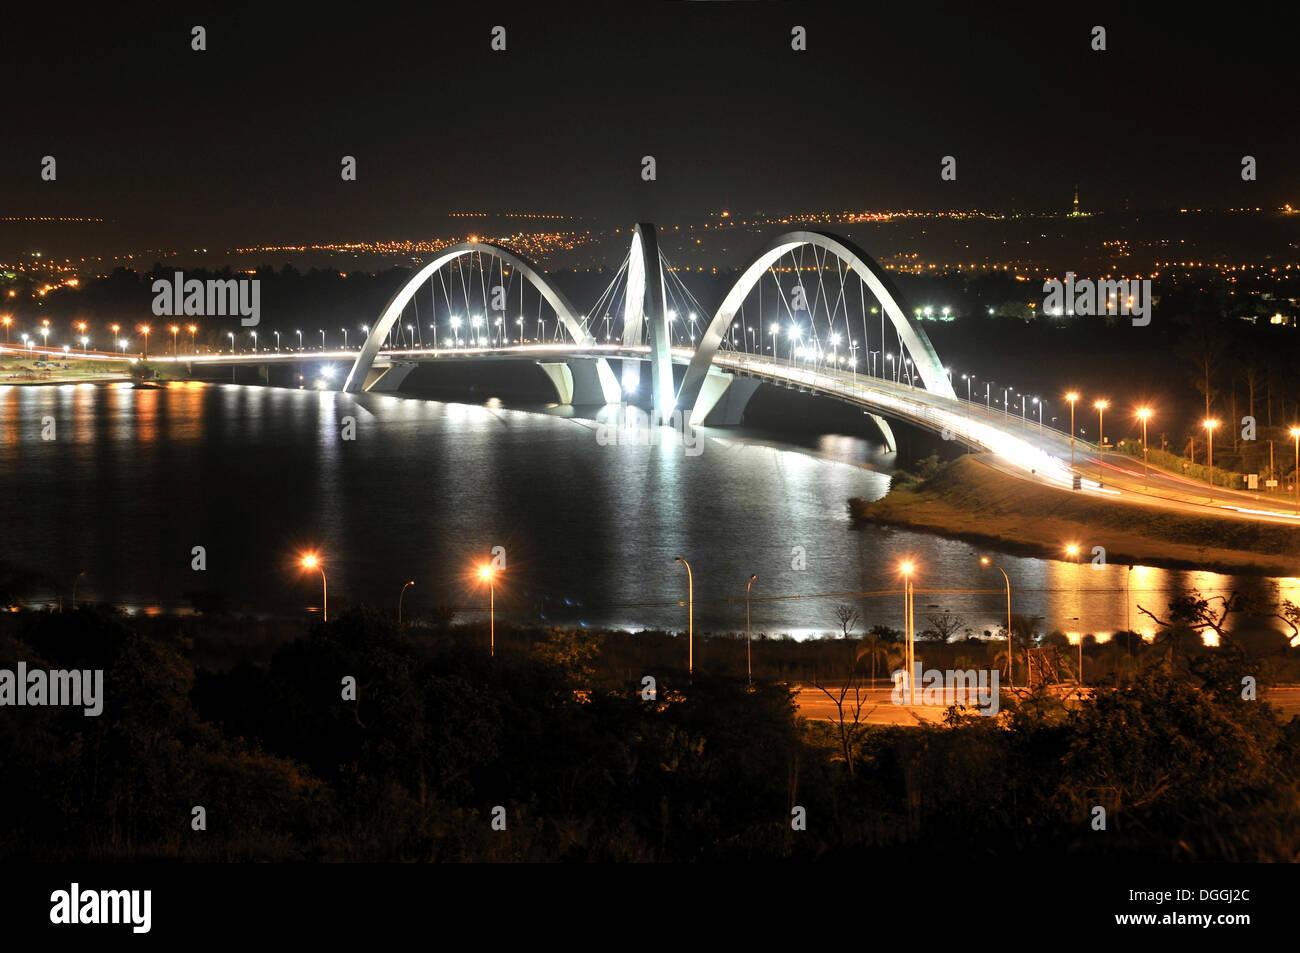 bridge architecture night - photo #21